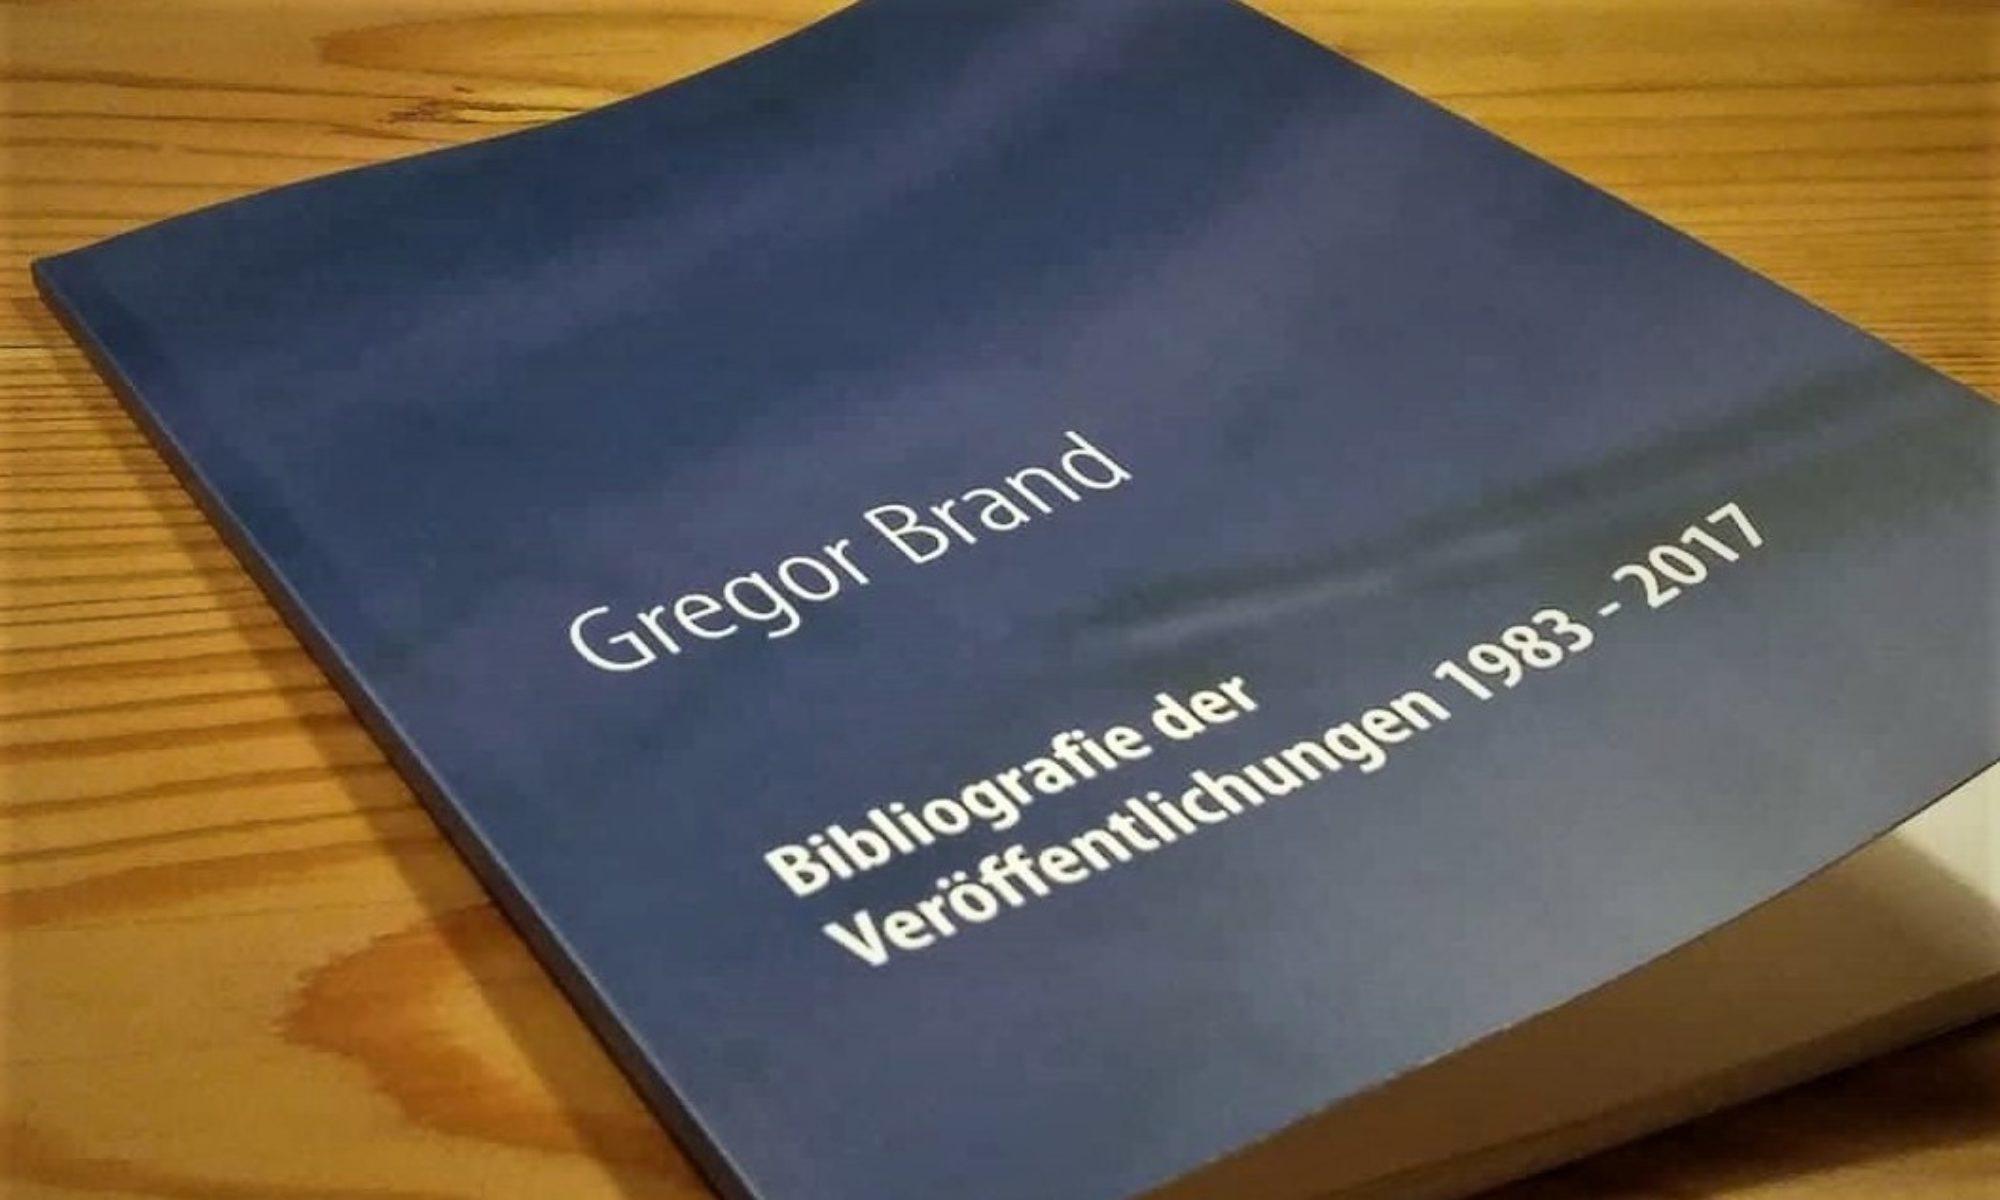 Gregor Brand: Schriftsteller